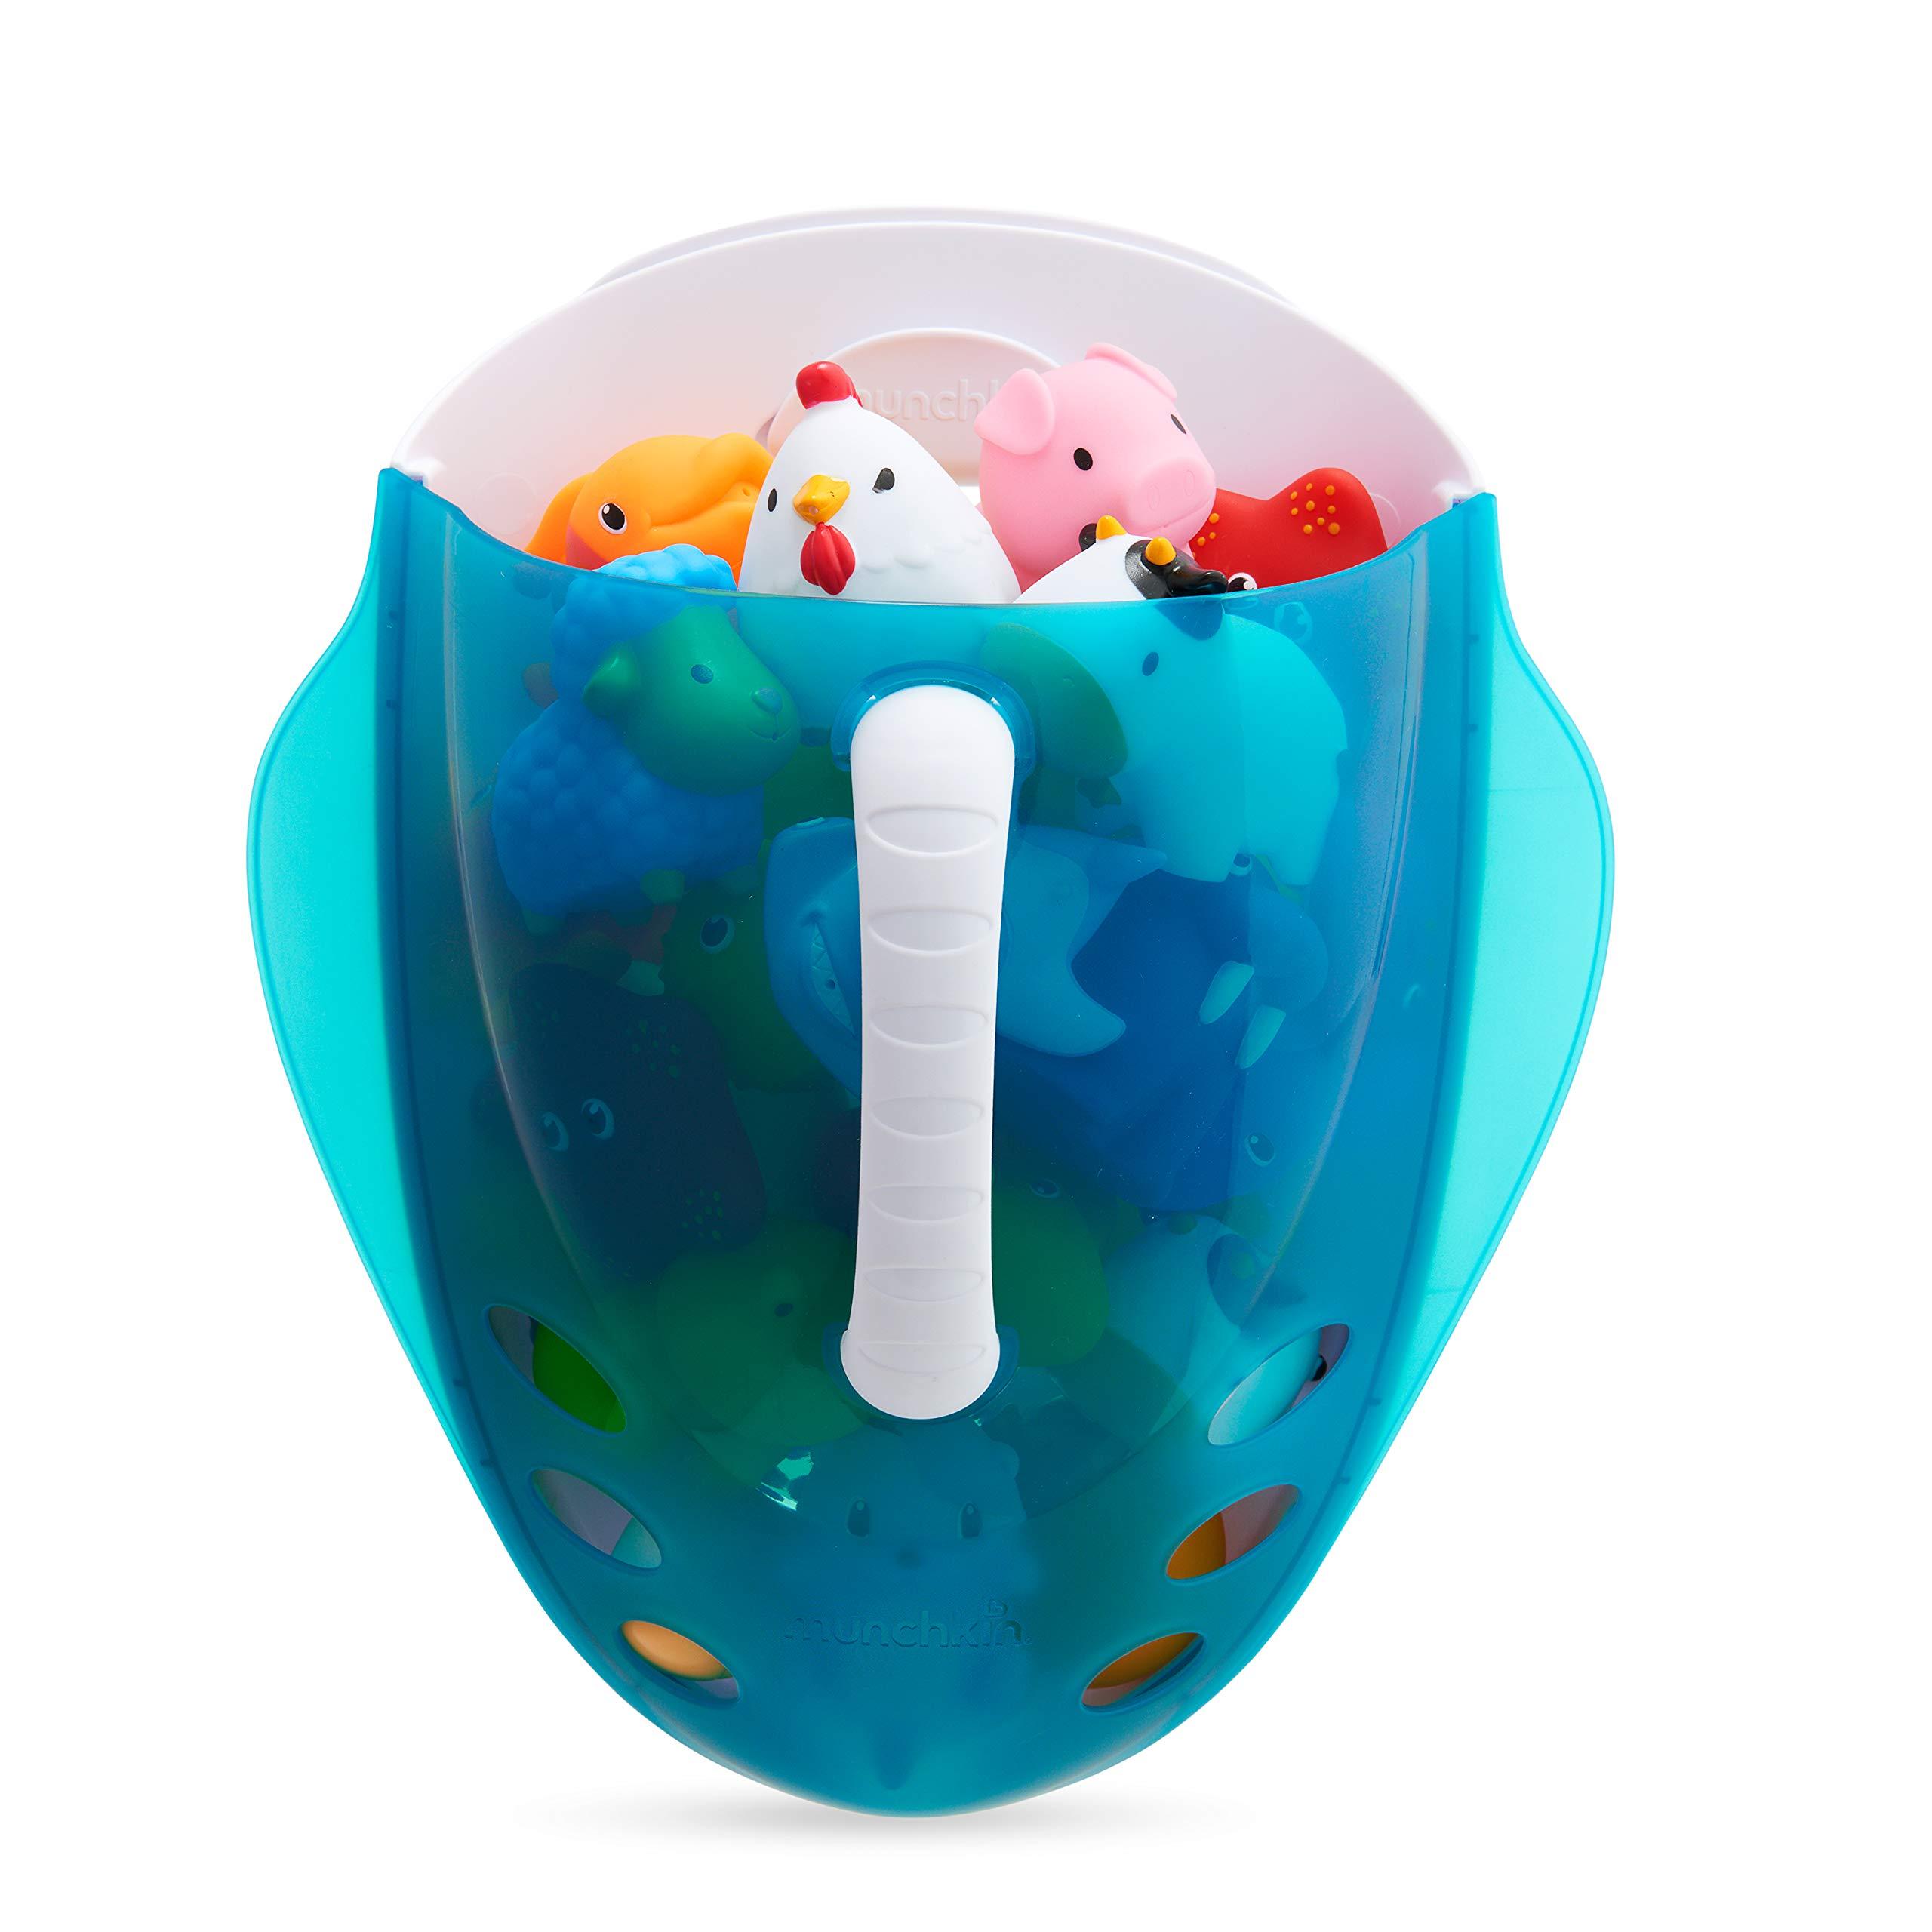 Guarda Juguetes para la Bañera Munchkin product image